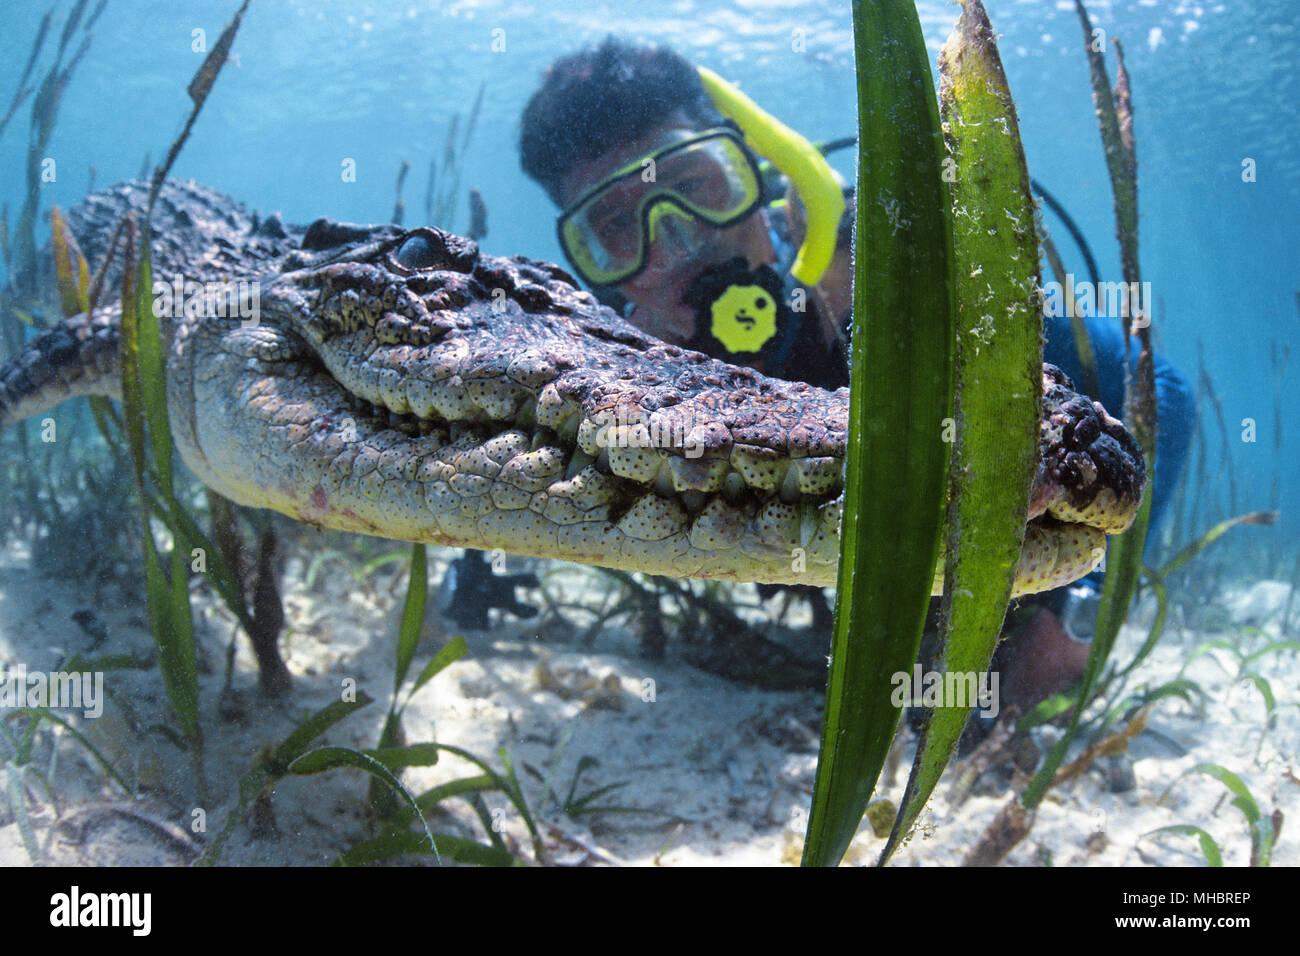 Diver and Saltwater crocodile (Crocodylus porosus), Underwater, Palau, Micronesia - Stock Image